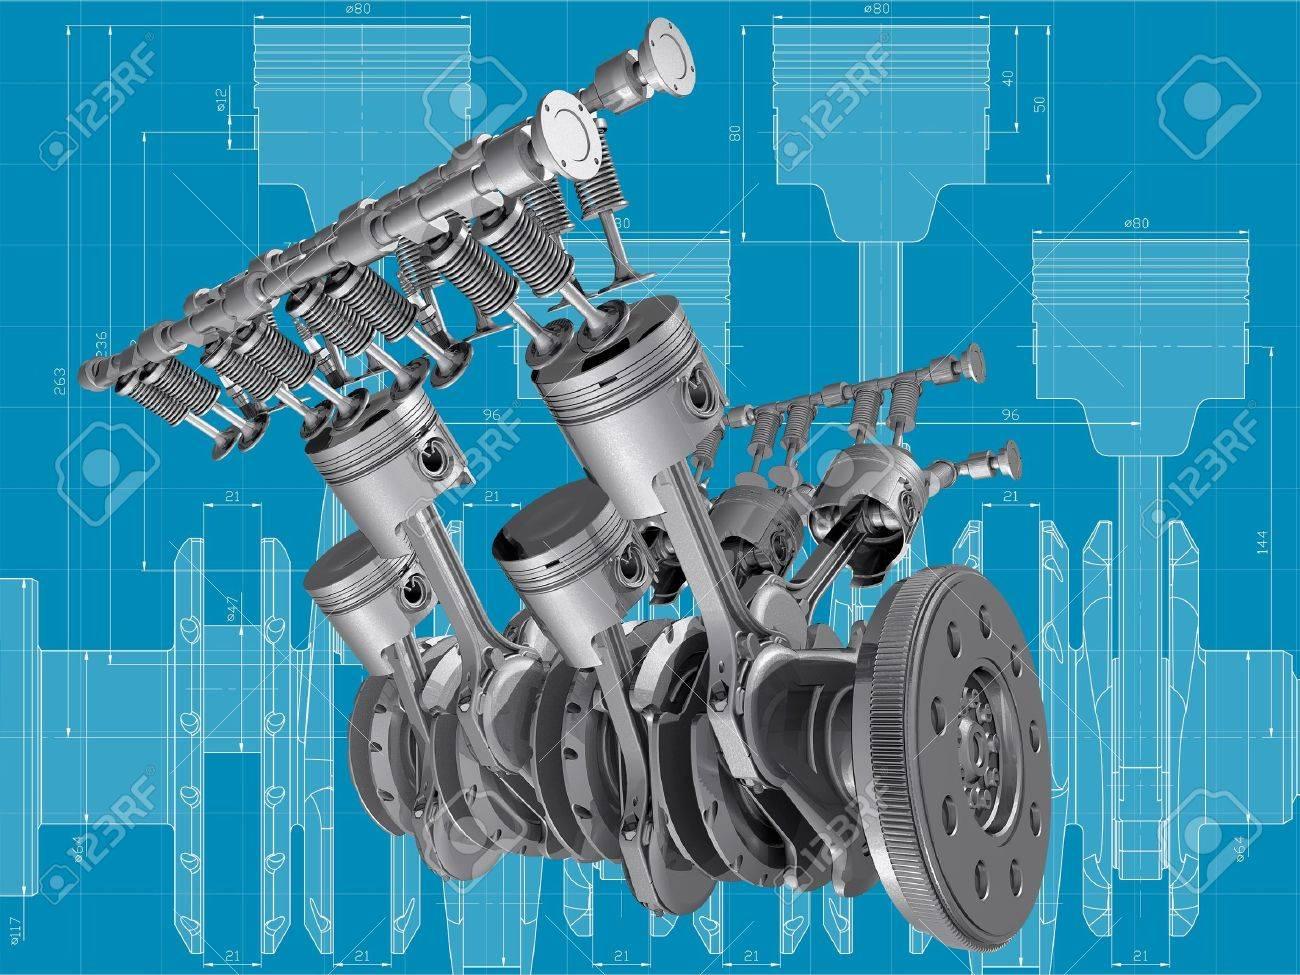 V8 Engine Pistons, Valves And Crankshaft On Blueprint. 3D Image ...